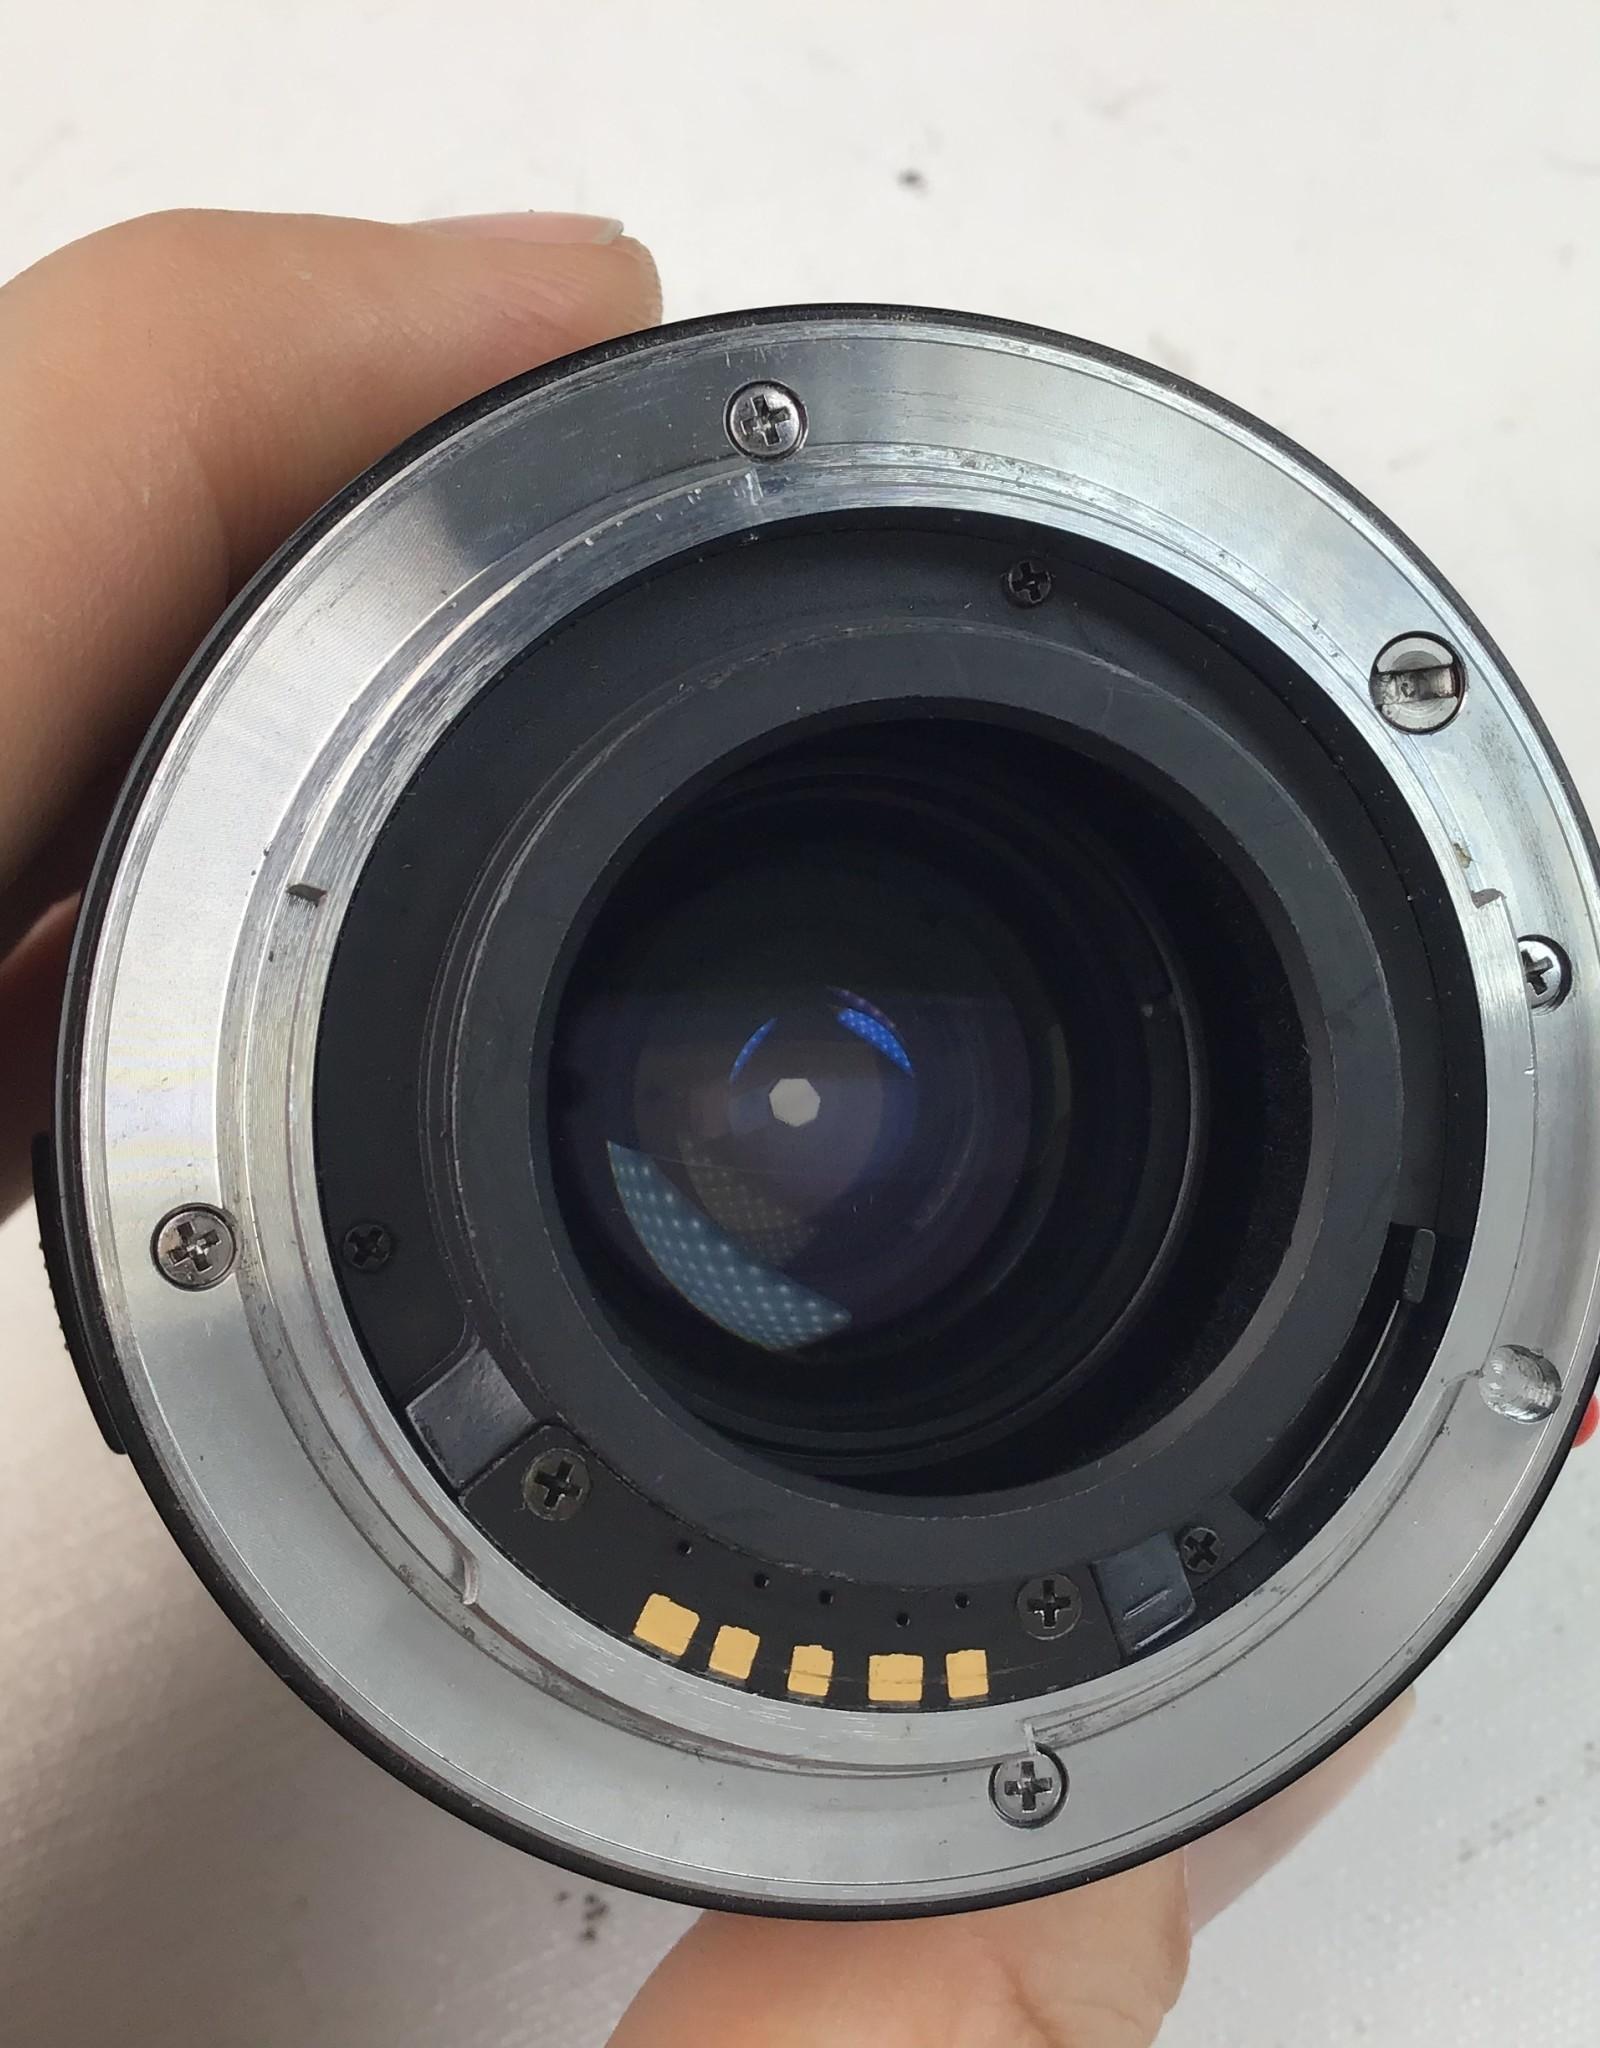 Minolta Minolta Maxxum AF 28-85mm f3.5-4.5 Lens Used Good